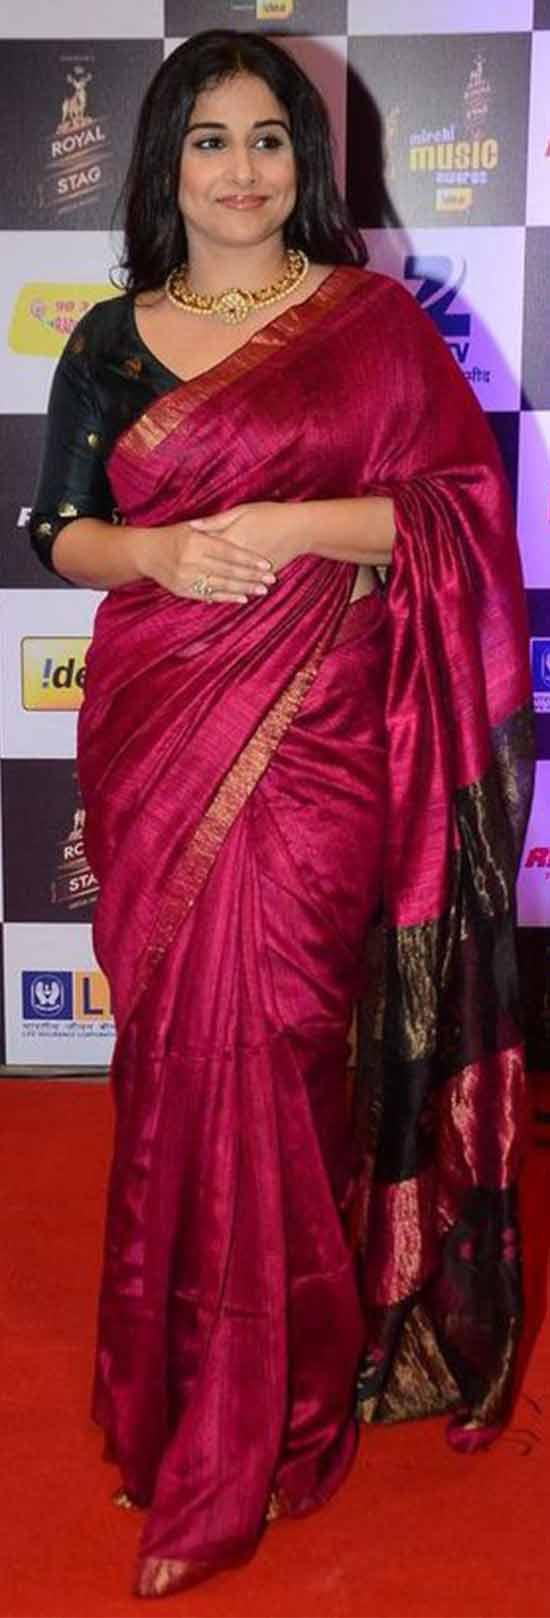 Vidya-Balan-Latest-Hot-Spicy-Traditional-Pink-Saree